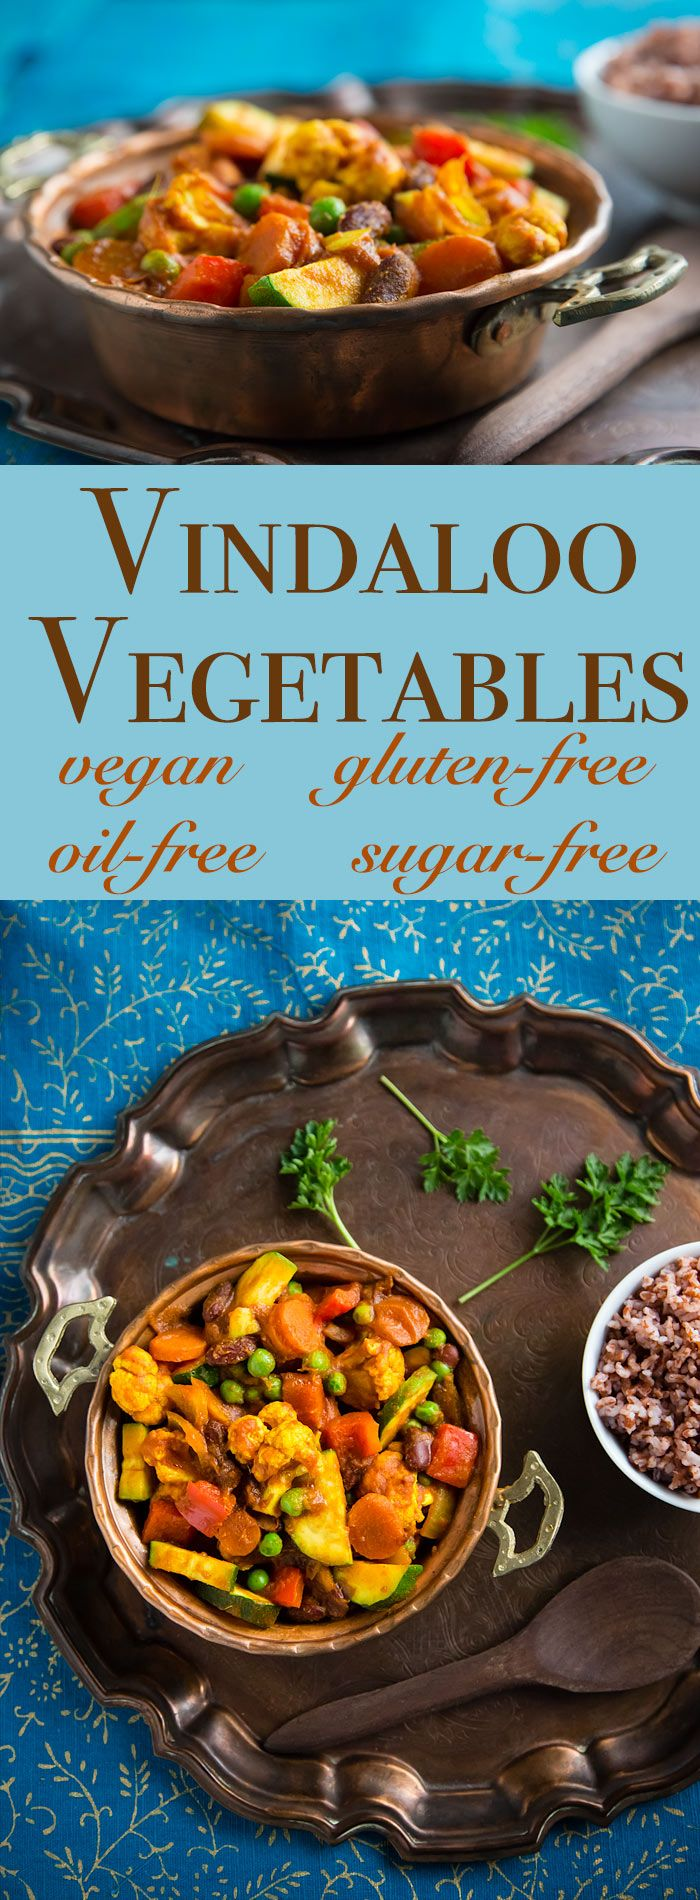 Vindaloo Vegetables Recipe Indian food recipes, Vegan